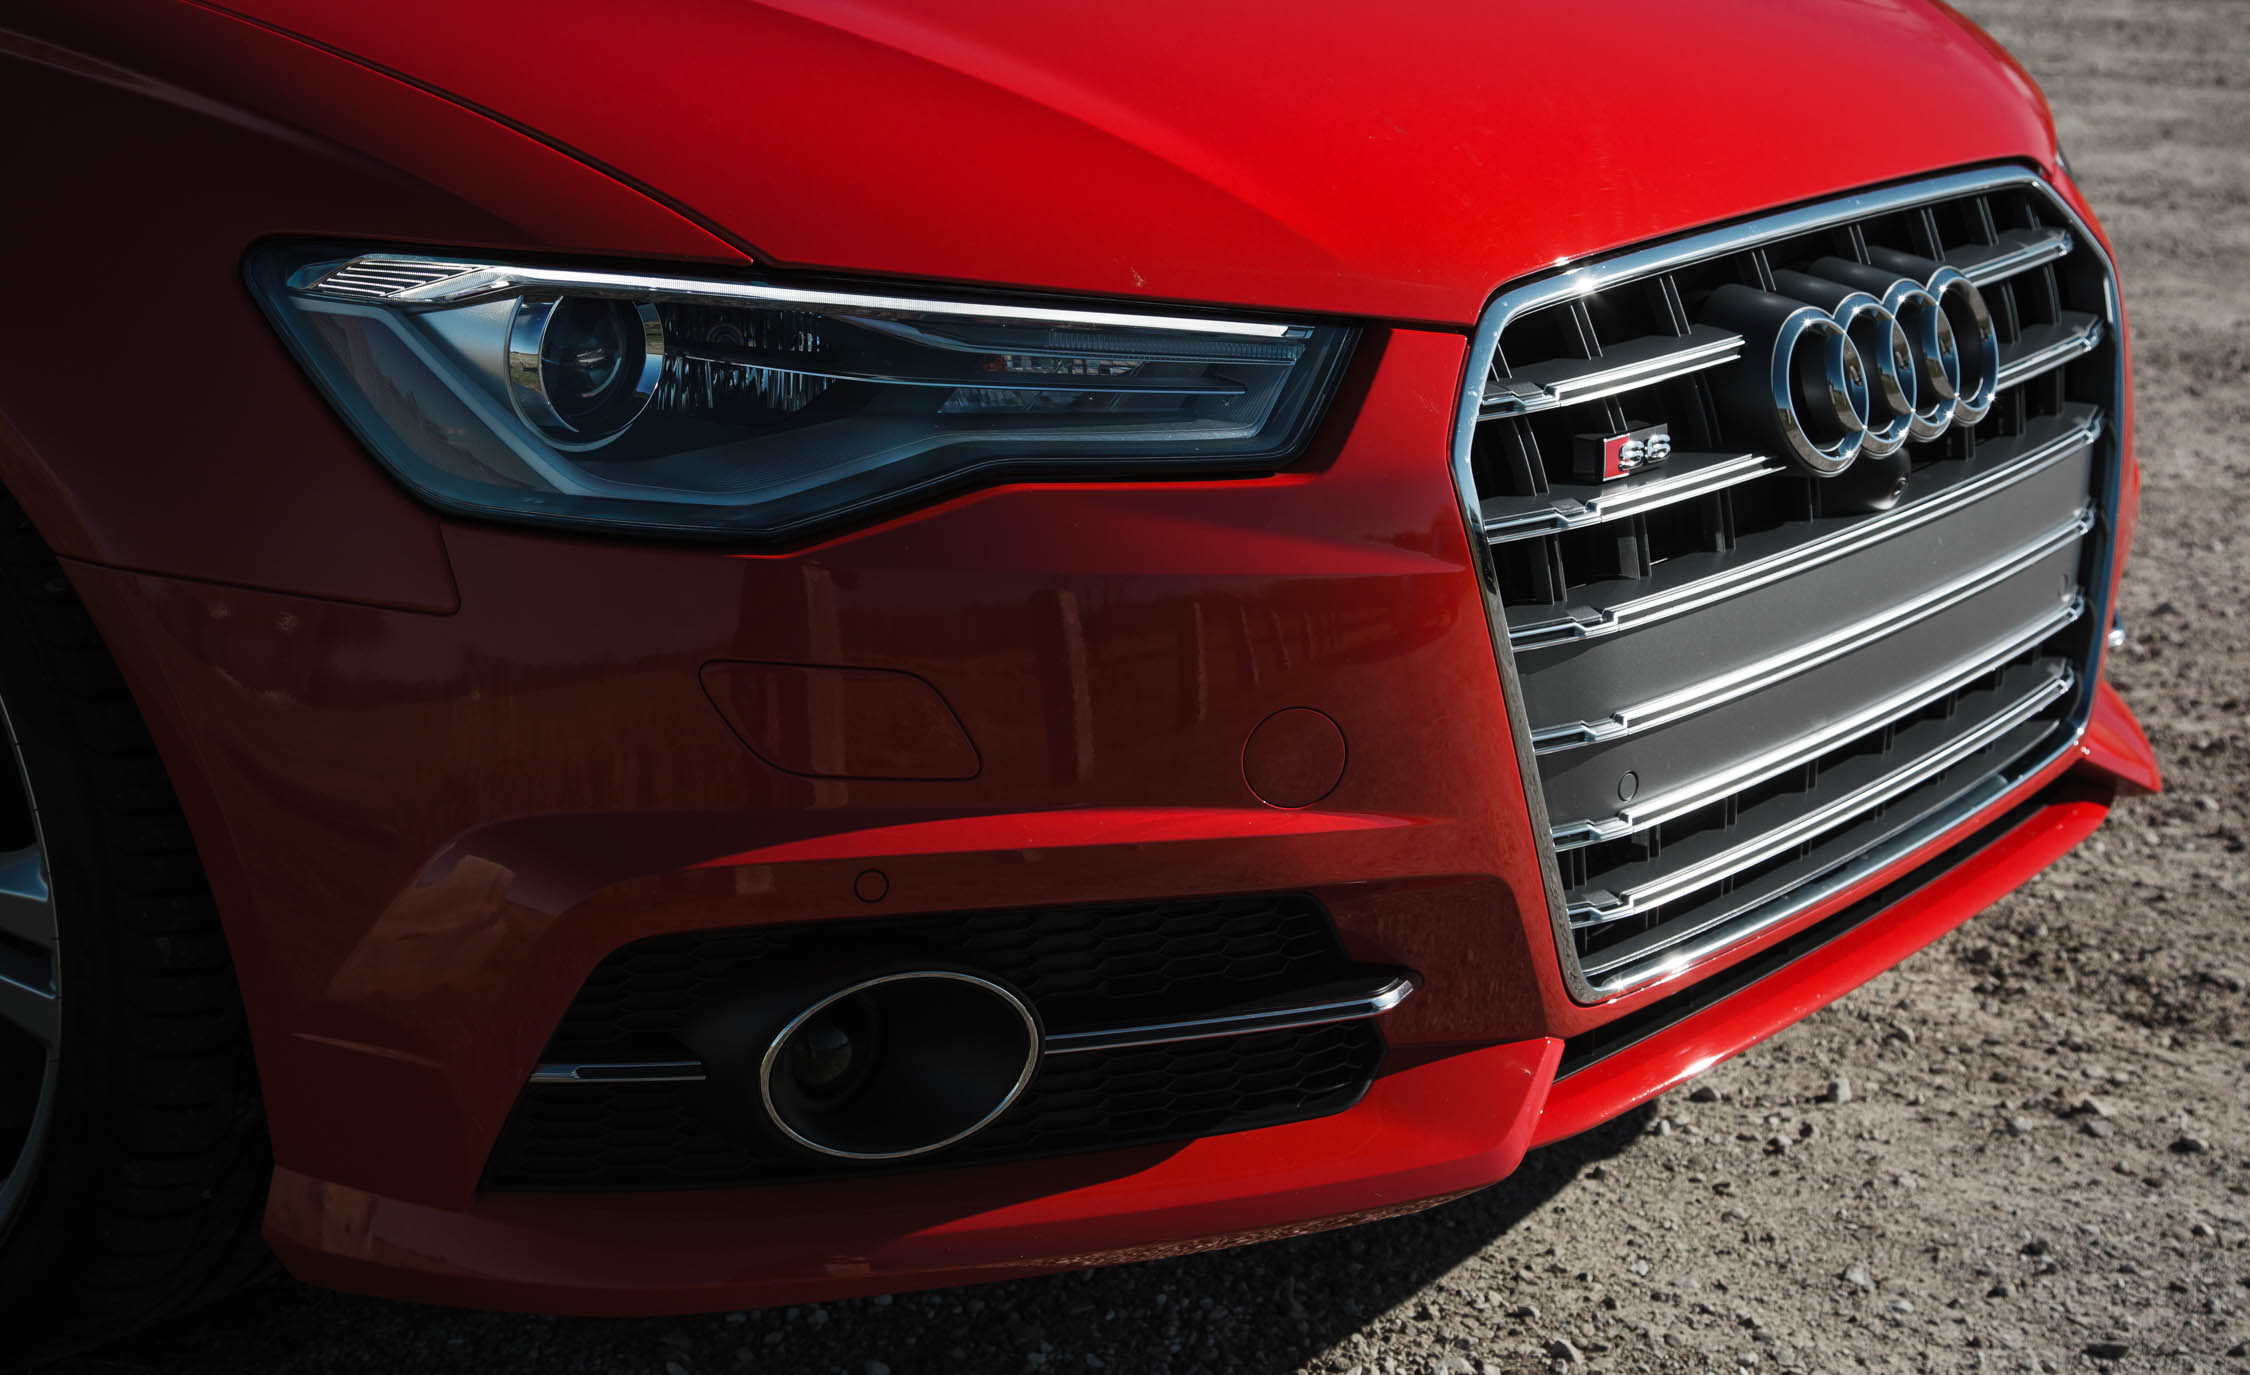 2016 Audi S6 Exterior Grille